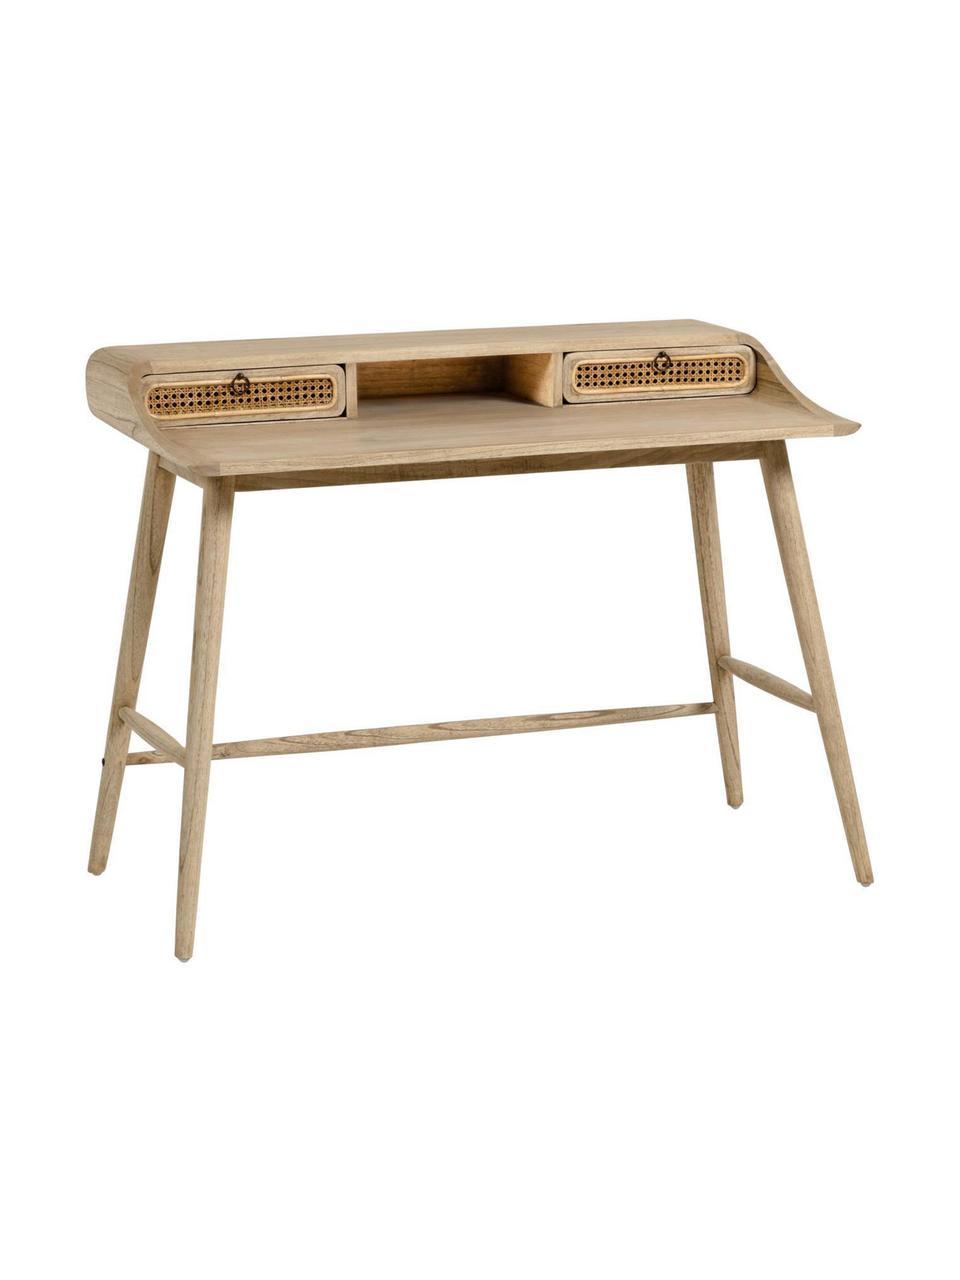 Schreibtisch Nalu aus Holz mit Wiener Geflecht, Griffe: Metall, lackiert, Mindiholz, B 110 x T 60 cm